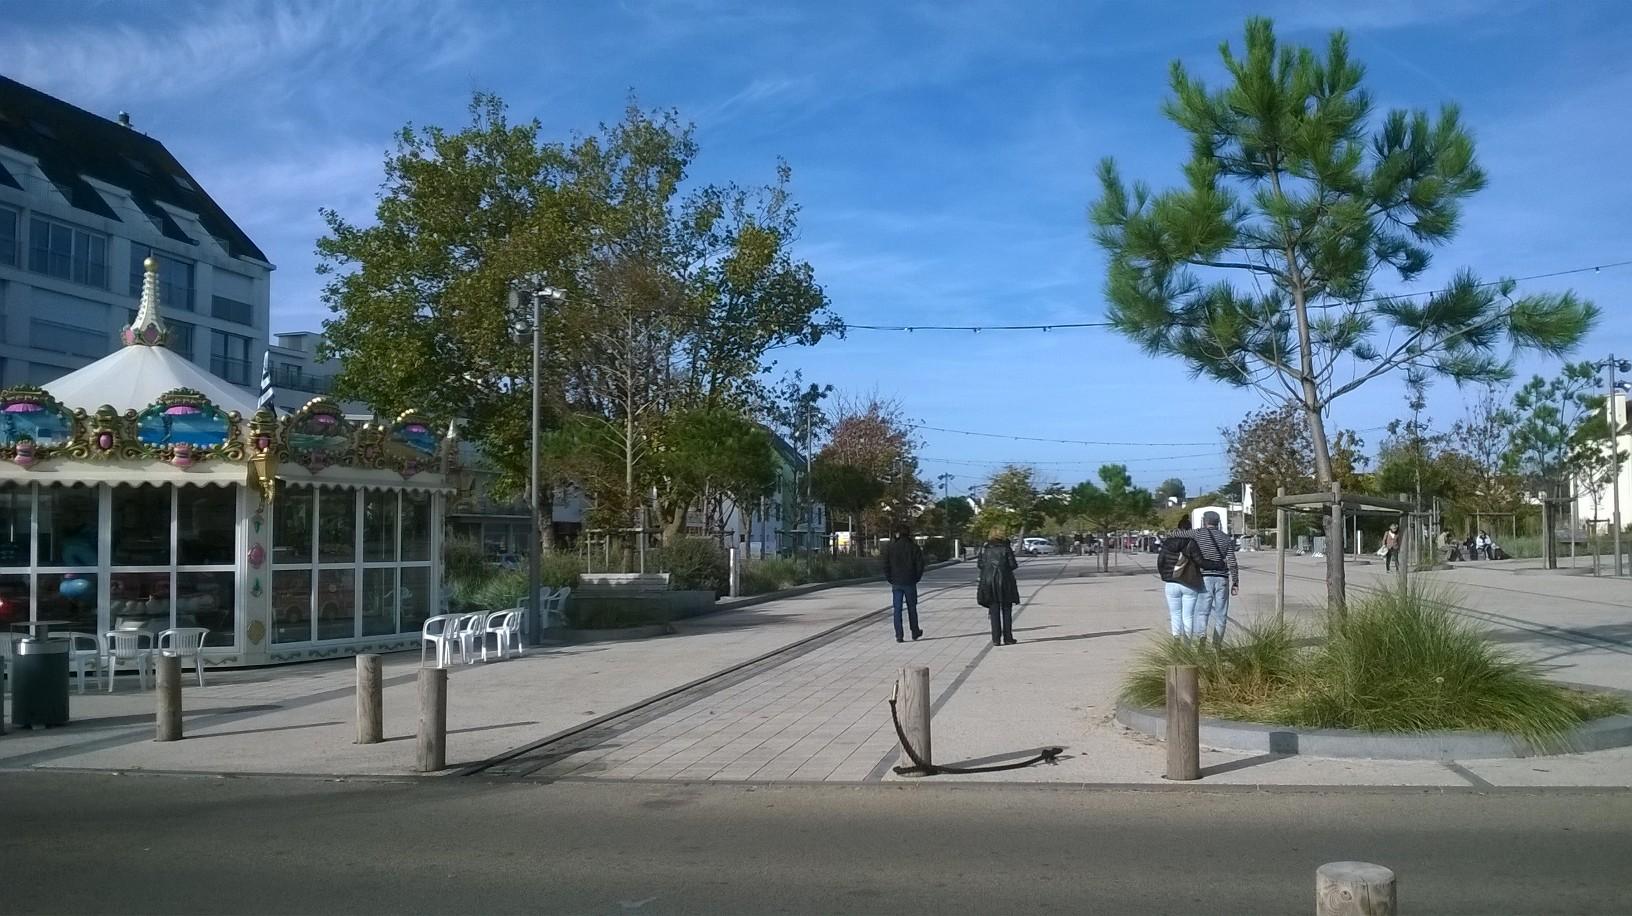 quiberon-carrousel-and-esp-hoche-to-parkings-nov16